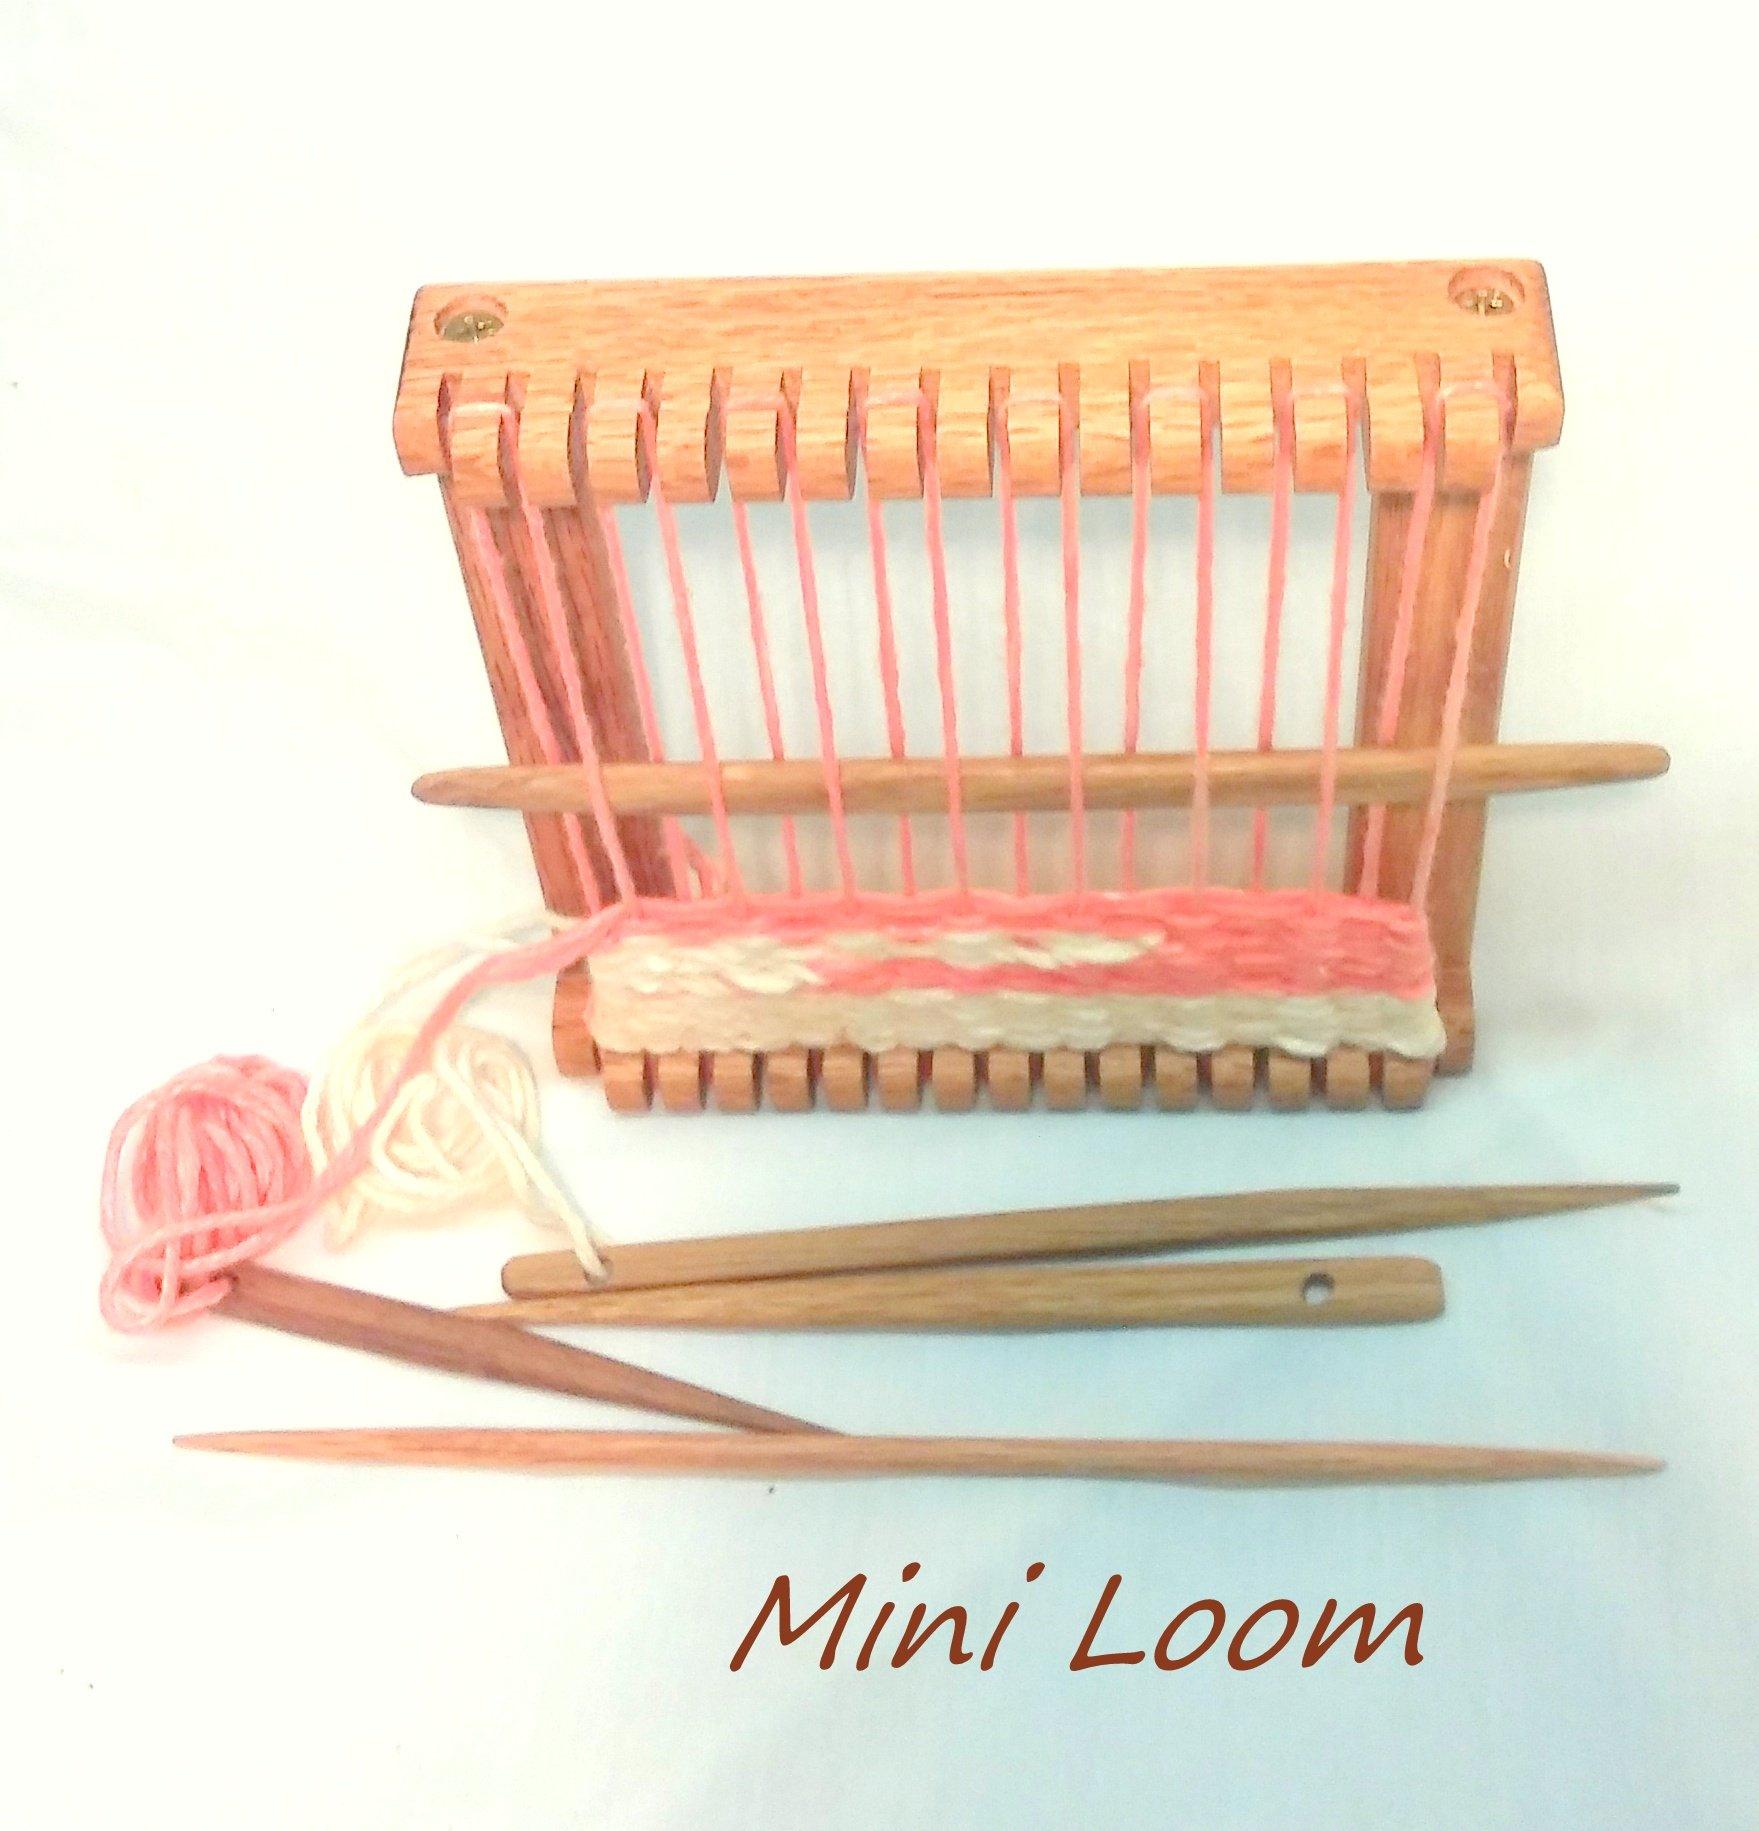 Lot of 10 Mini Loom kits 5 in. wide X 5 in. length